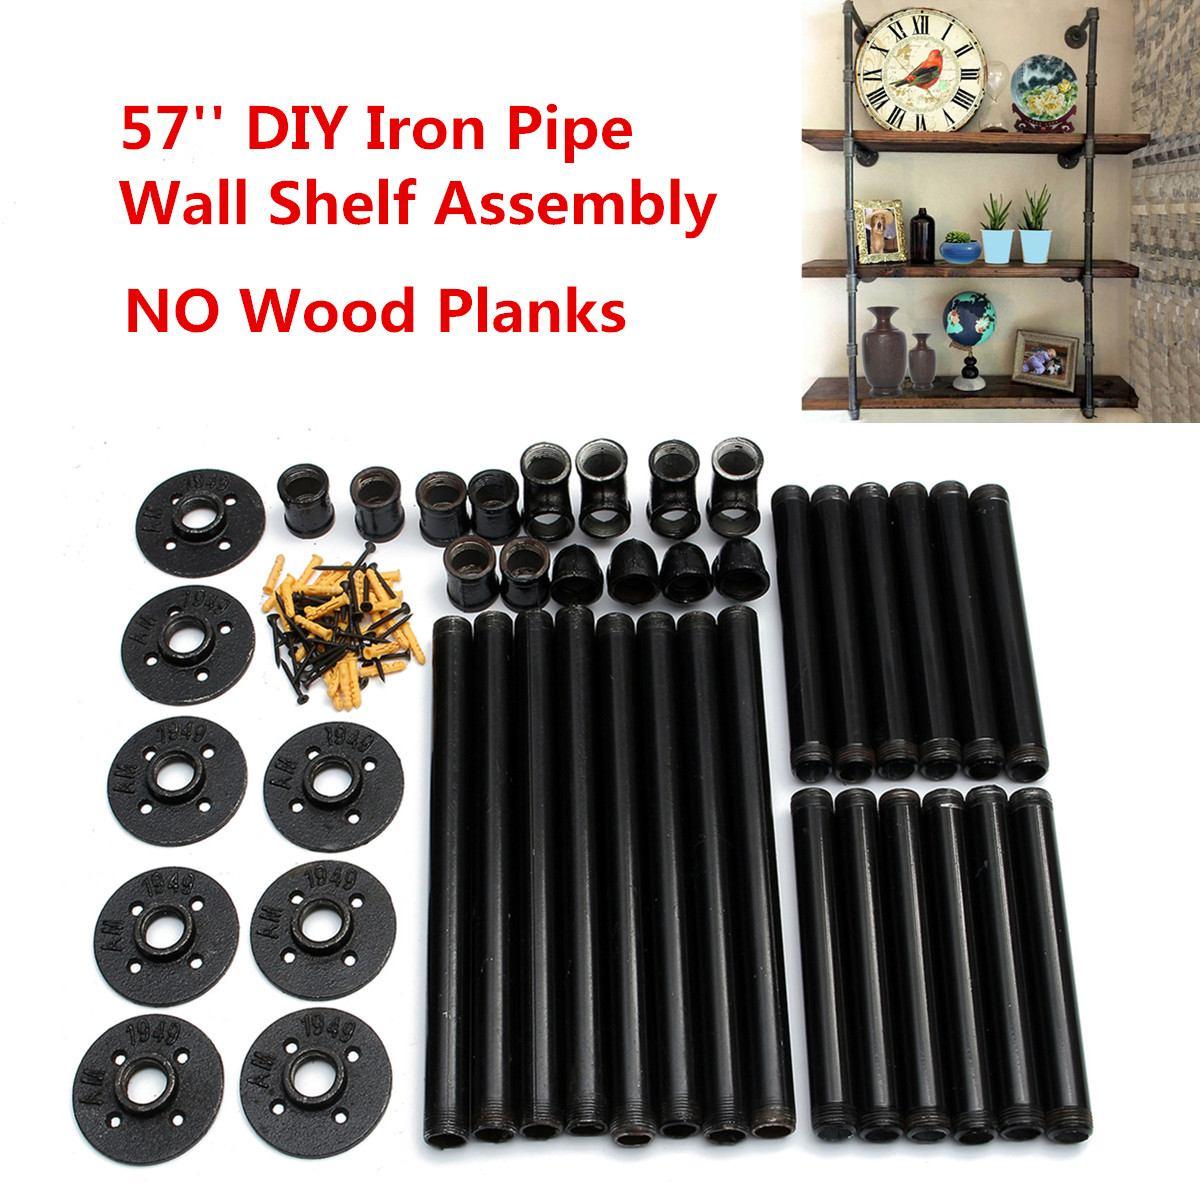 145cm Industrial Retro Bookshelf Black Wall Ceiling Mounted Wallshelf Open Bookshelf Parts Bracket 3 Layer Iron Pipe Shelf